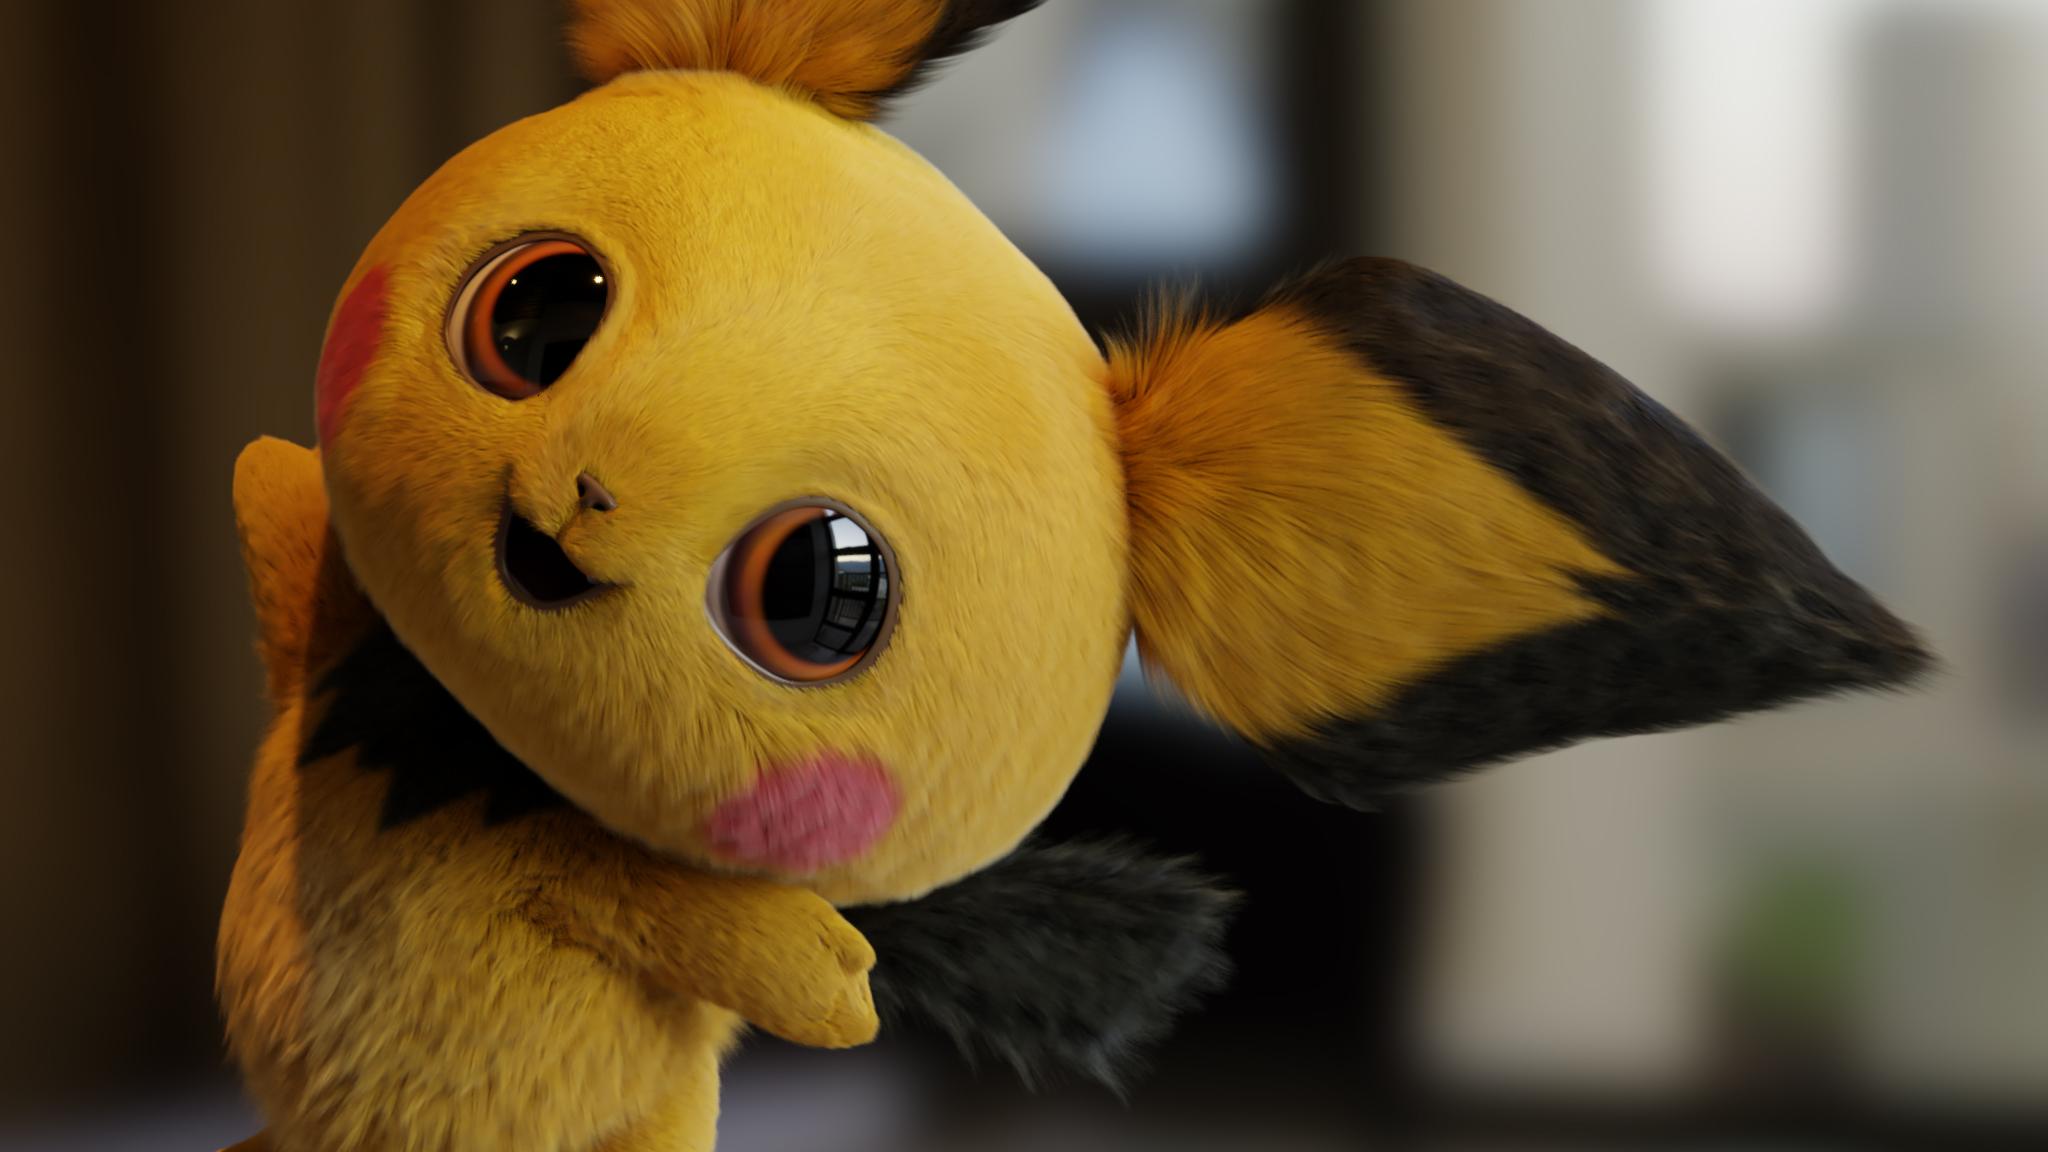 detective pikachu movie fanart hd movies 4k wallpapers